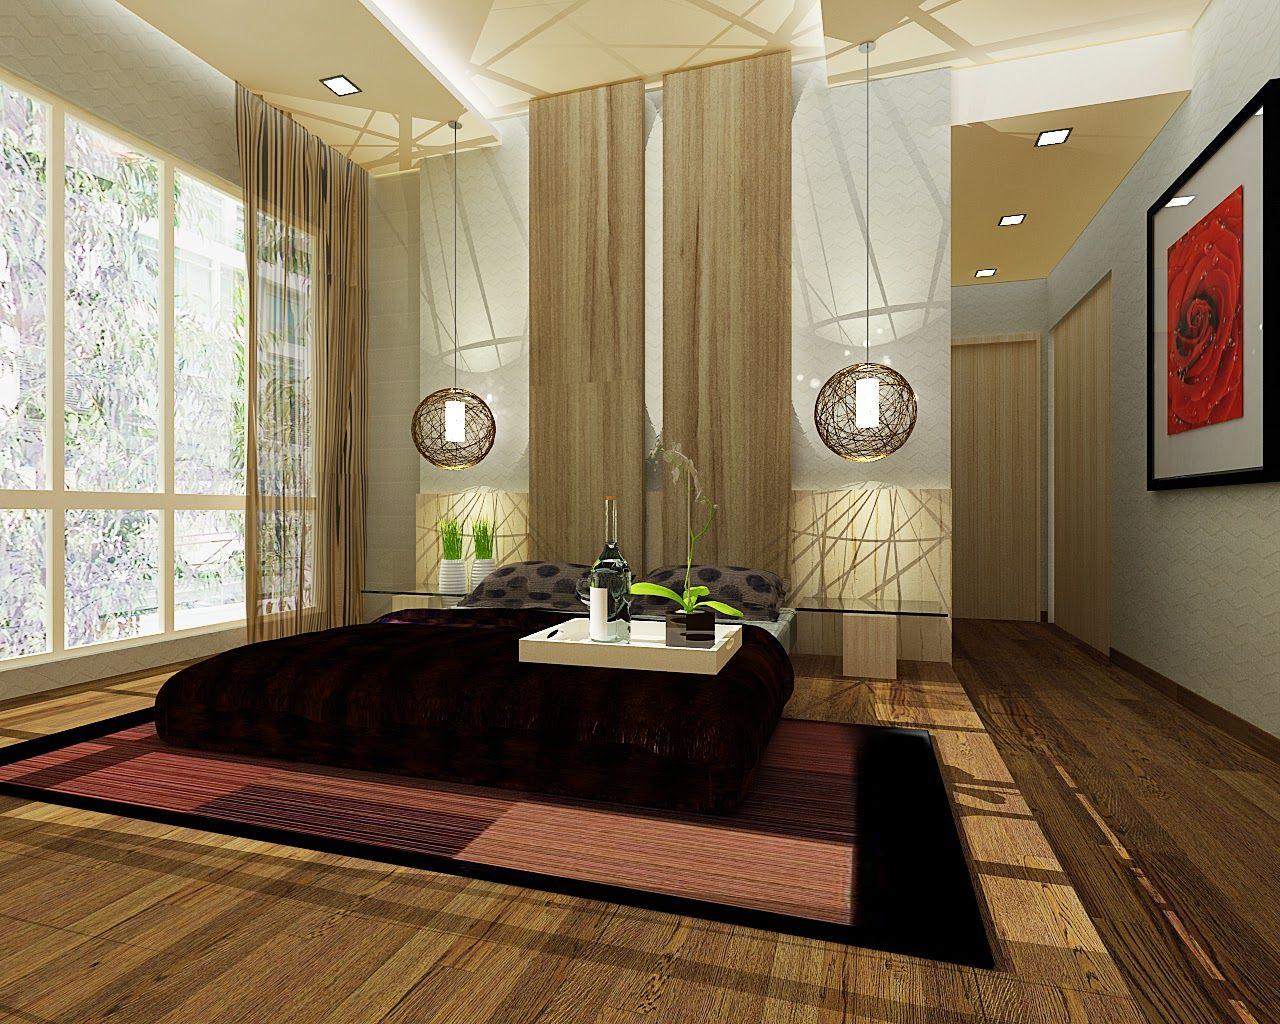 Bedroom glamor ideas zen style bedroom glamor ideas